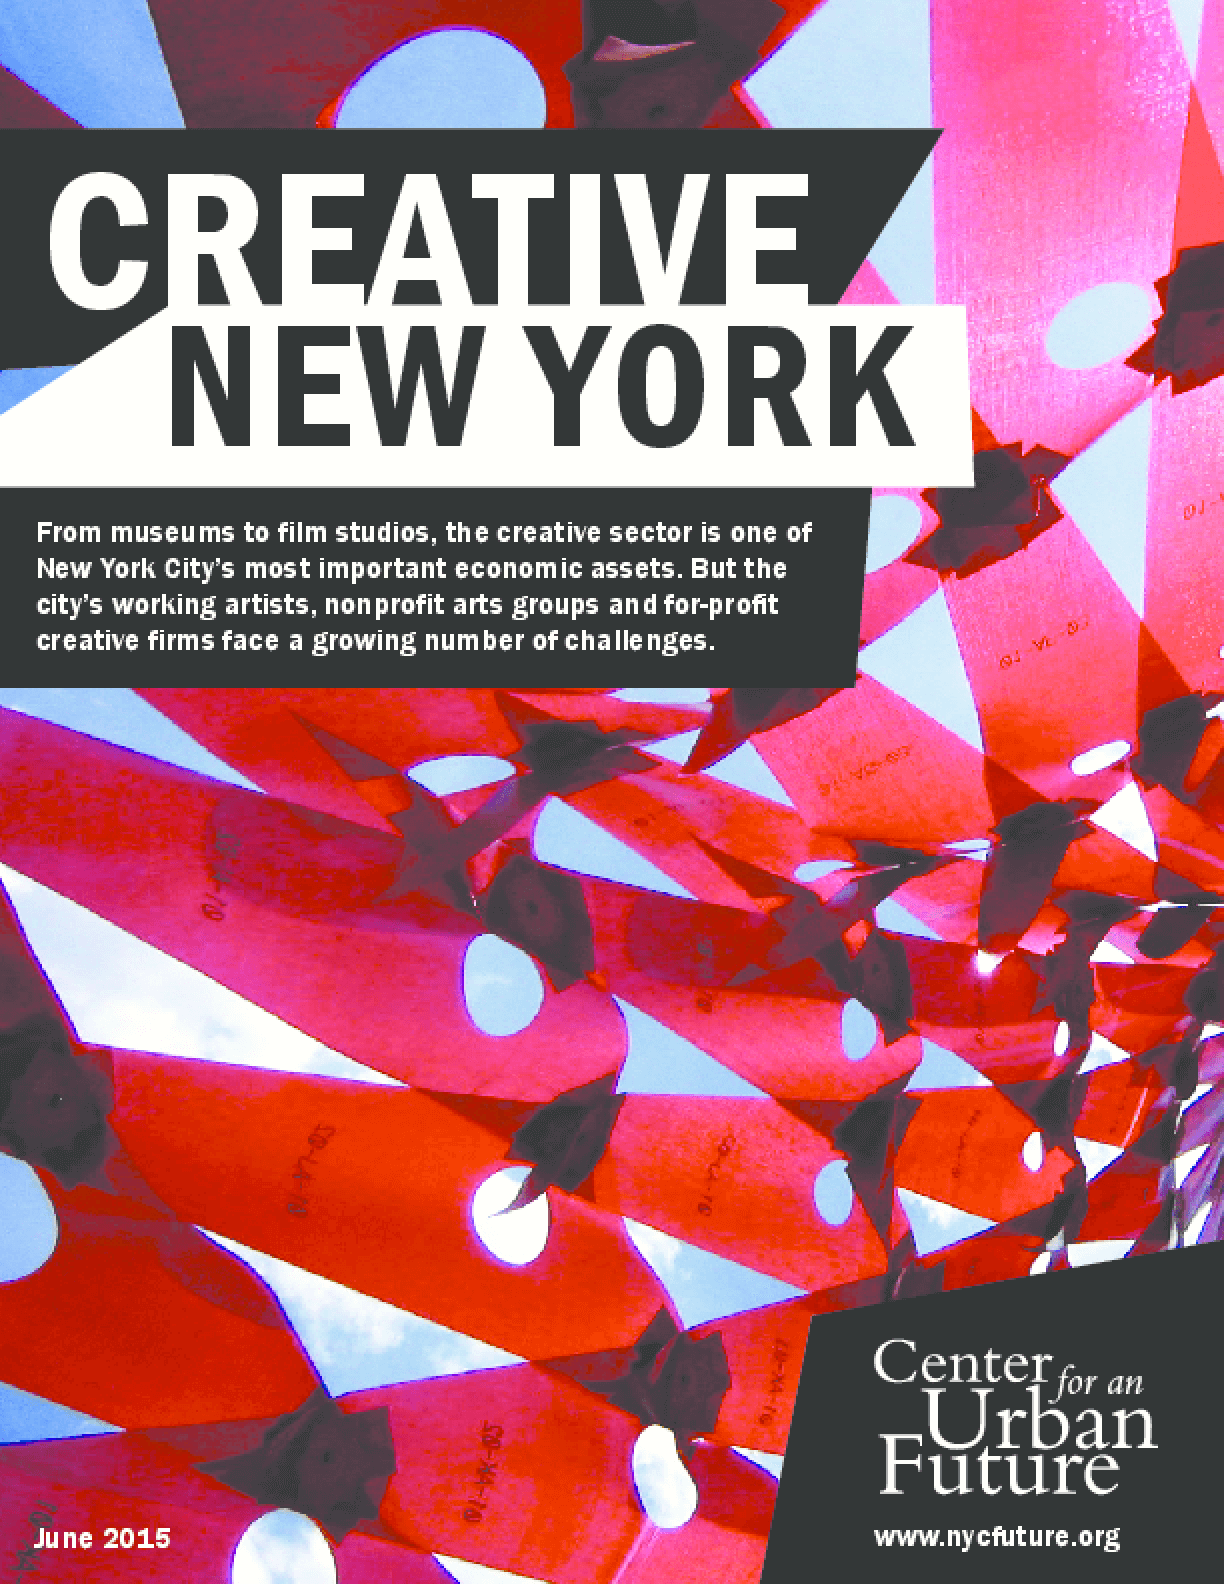 Creative New York 2015